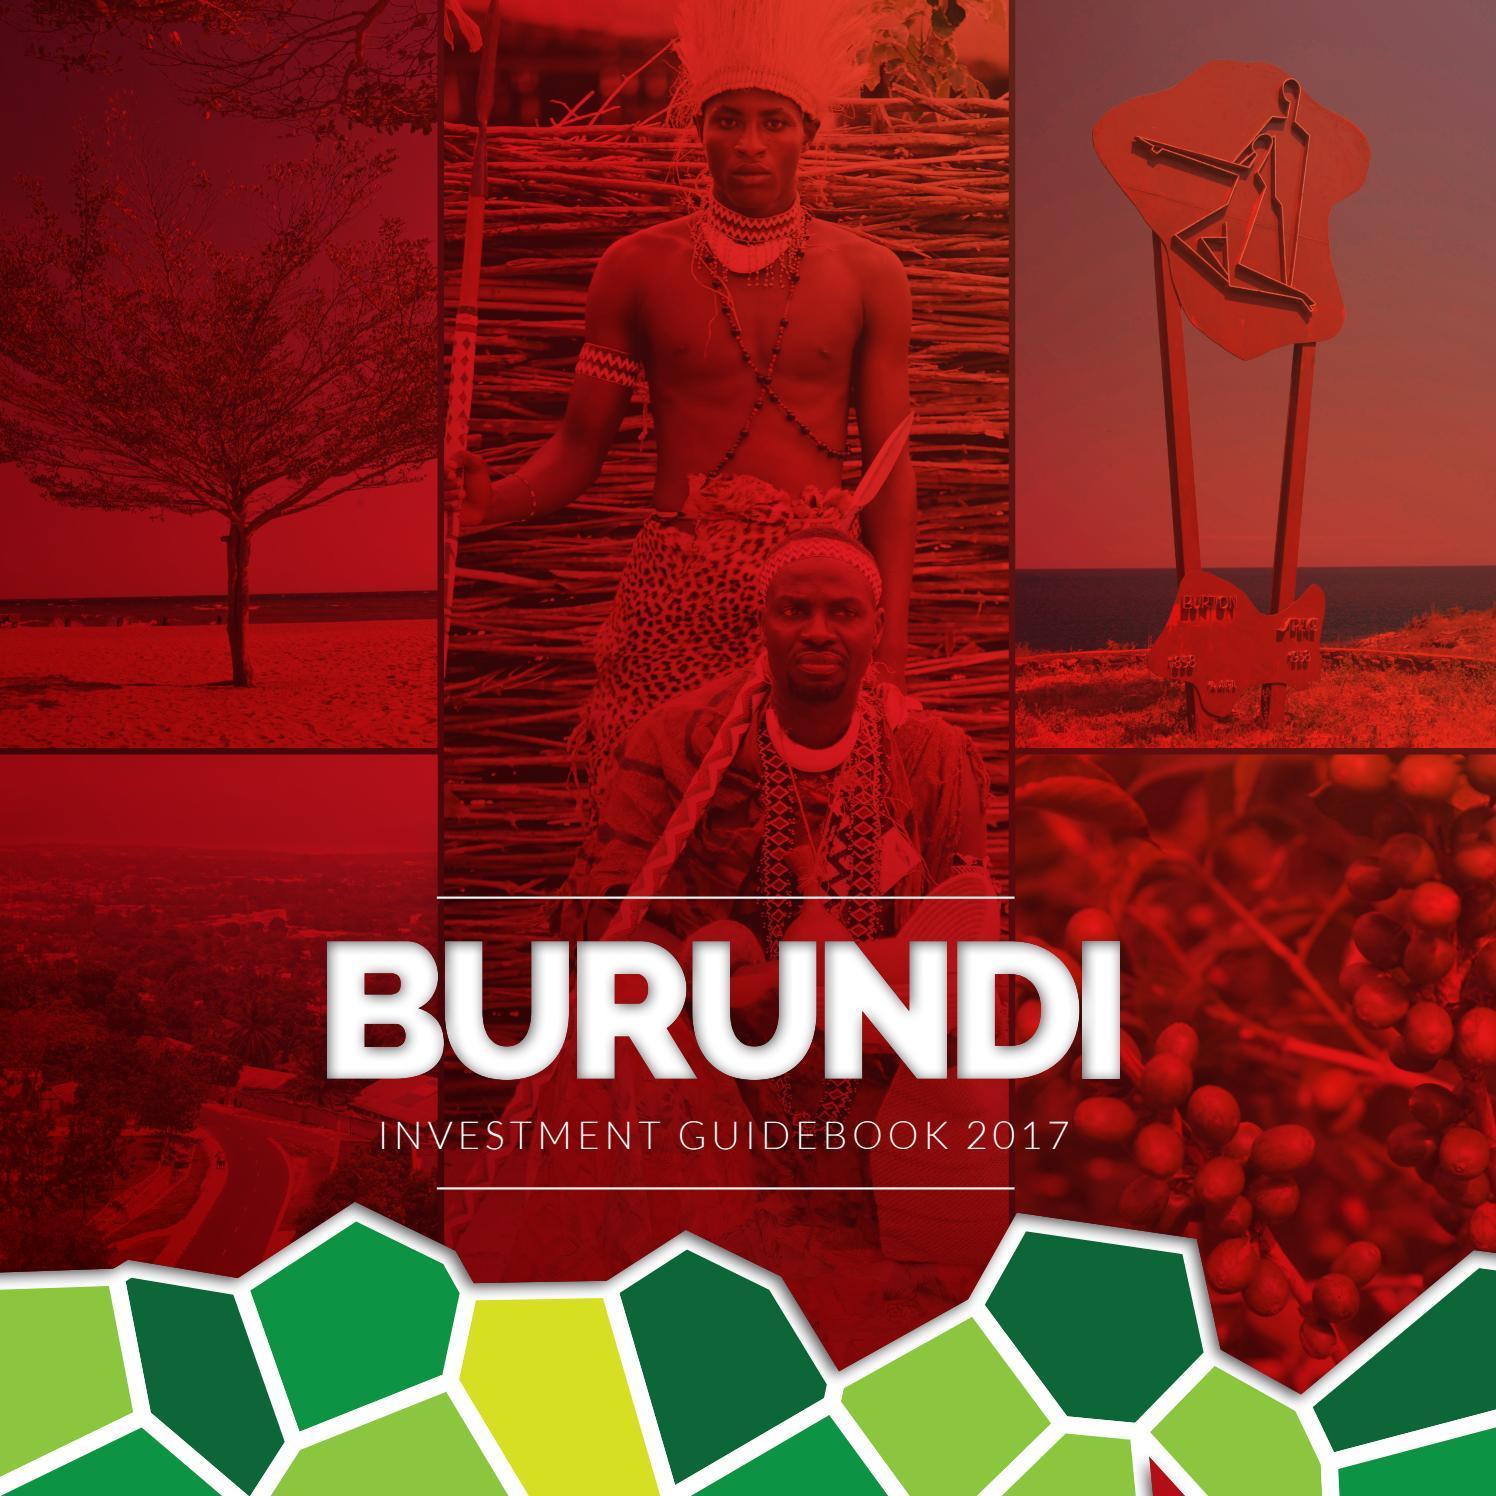 Burundi investment climate in kenya brian karavlan touchstone investments